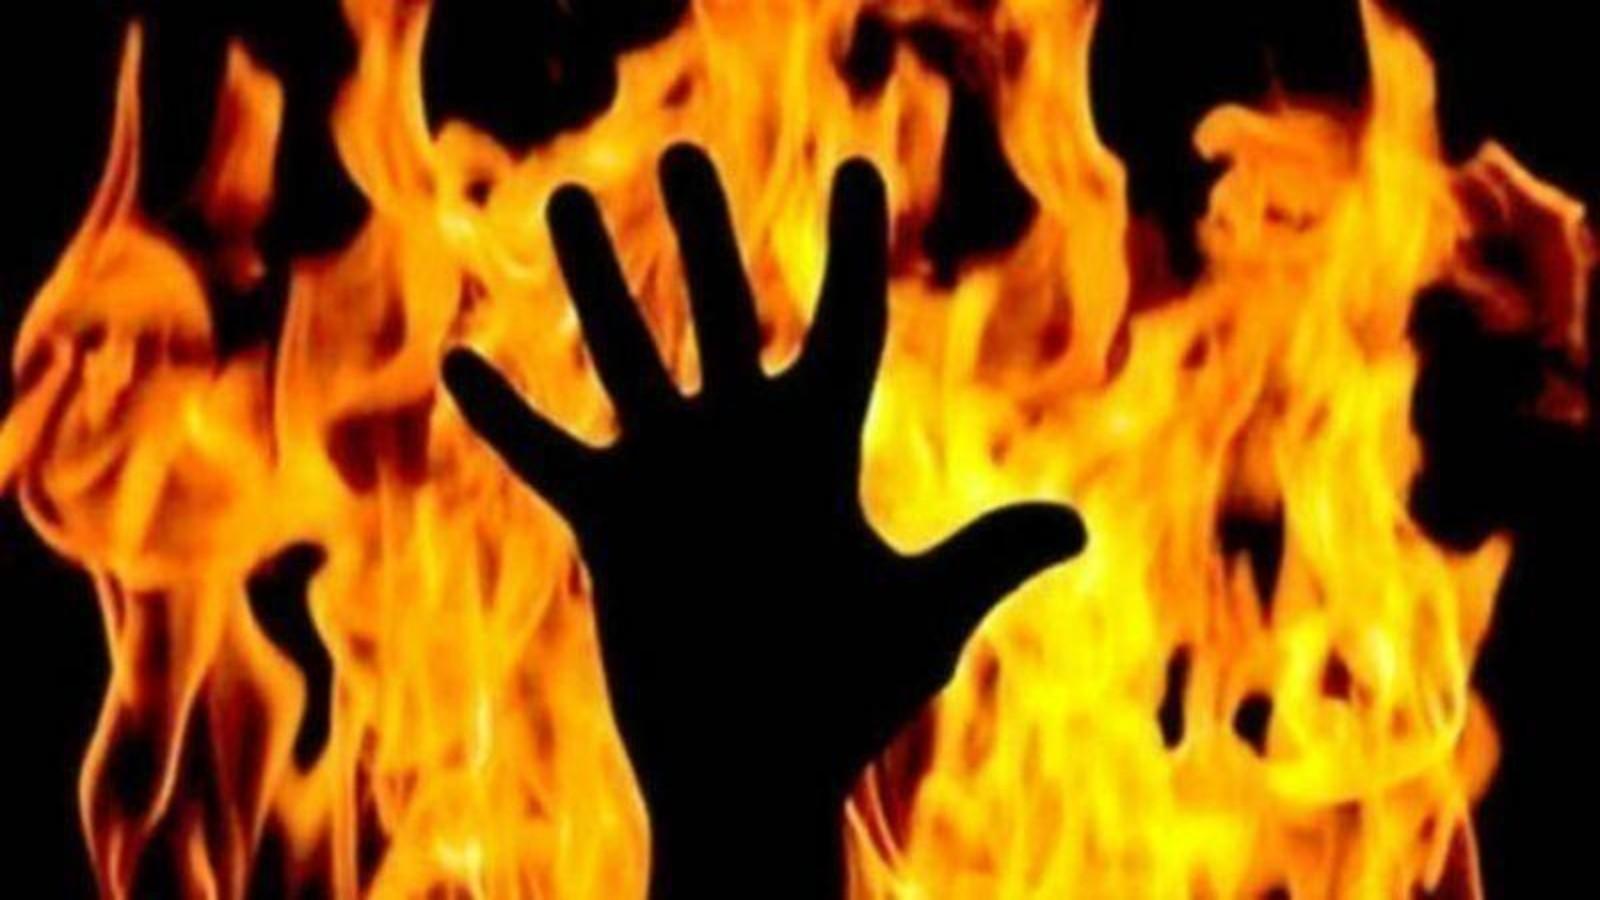 24-yr-old-dalit-man-set-ablaze-in-madhya-pradesh